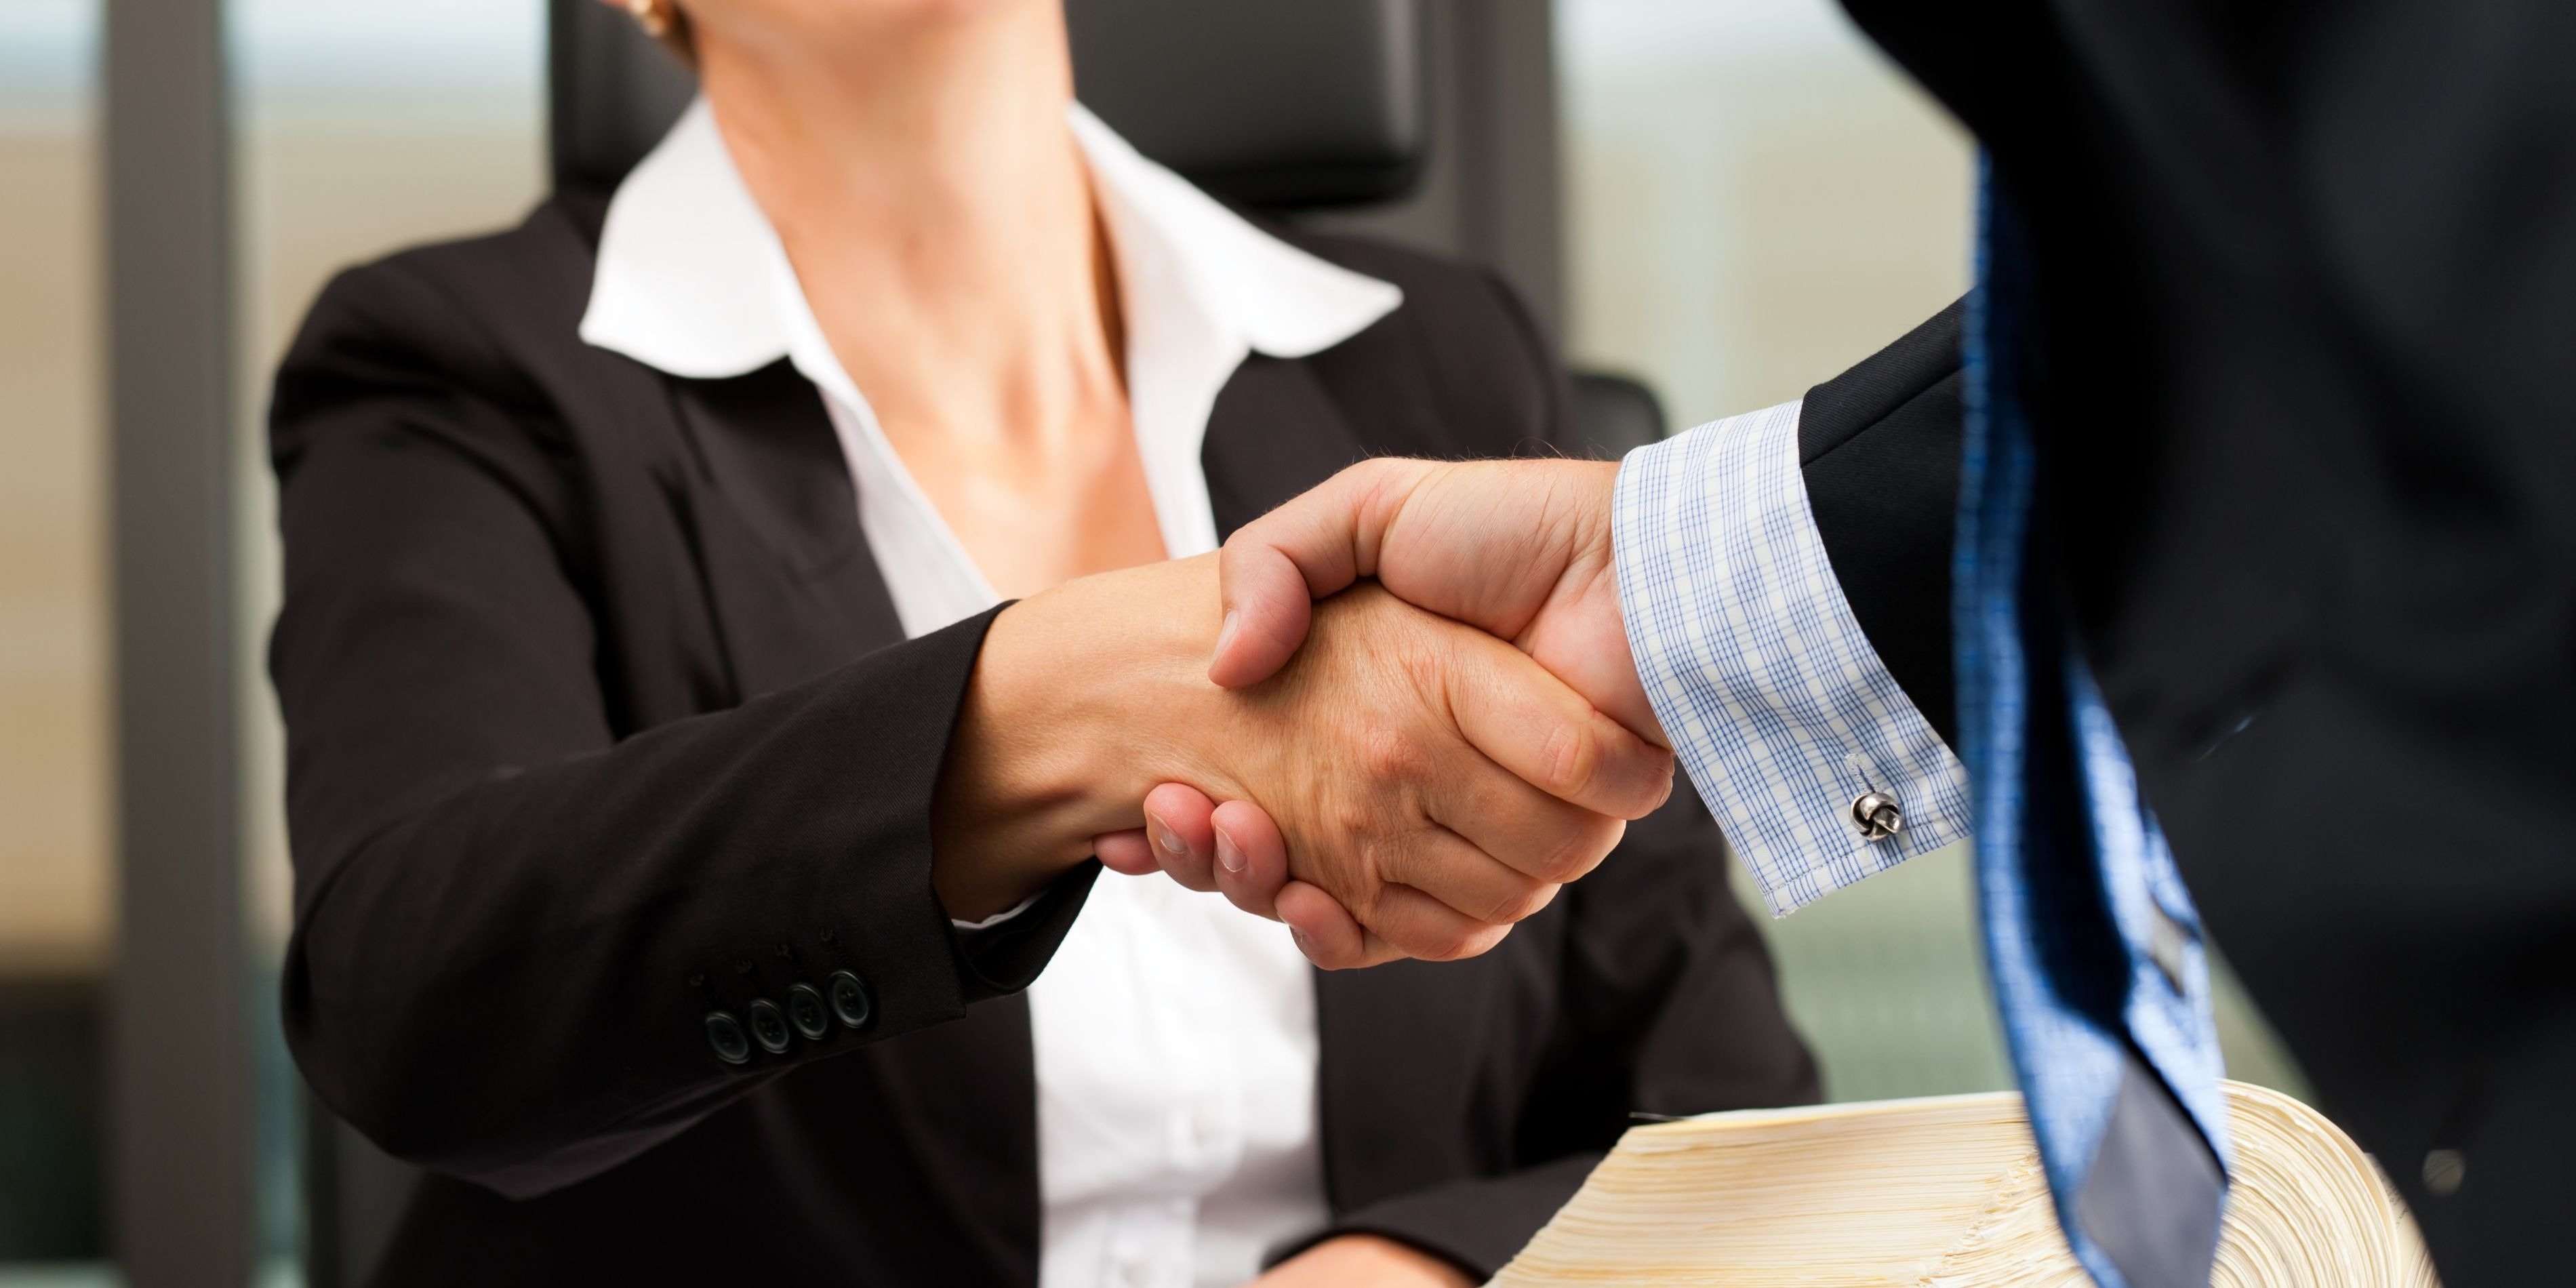 Negotiating While Female